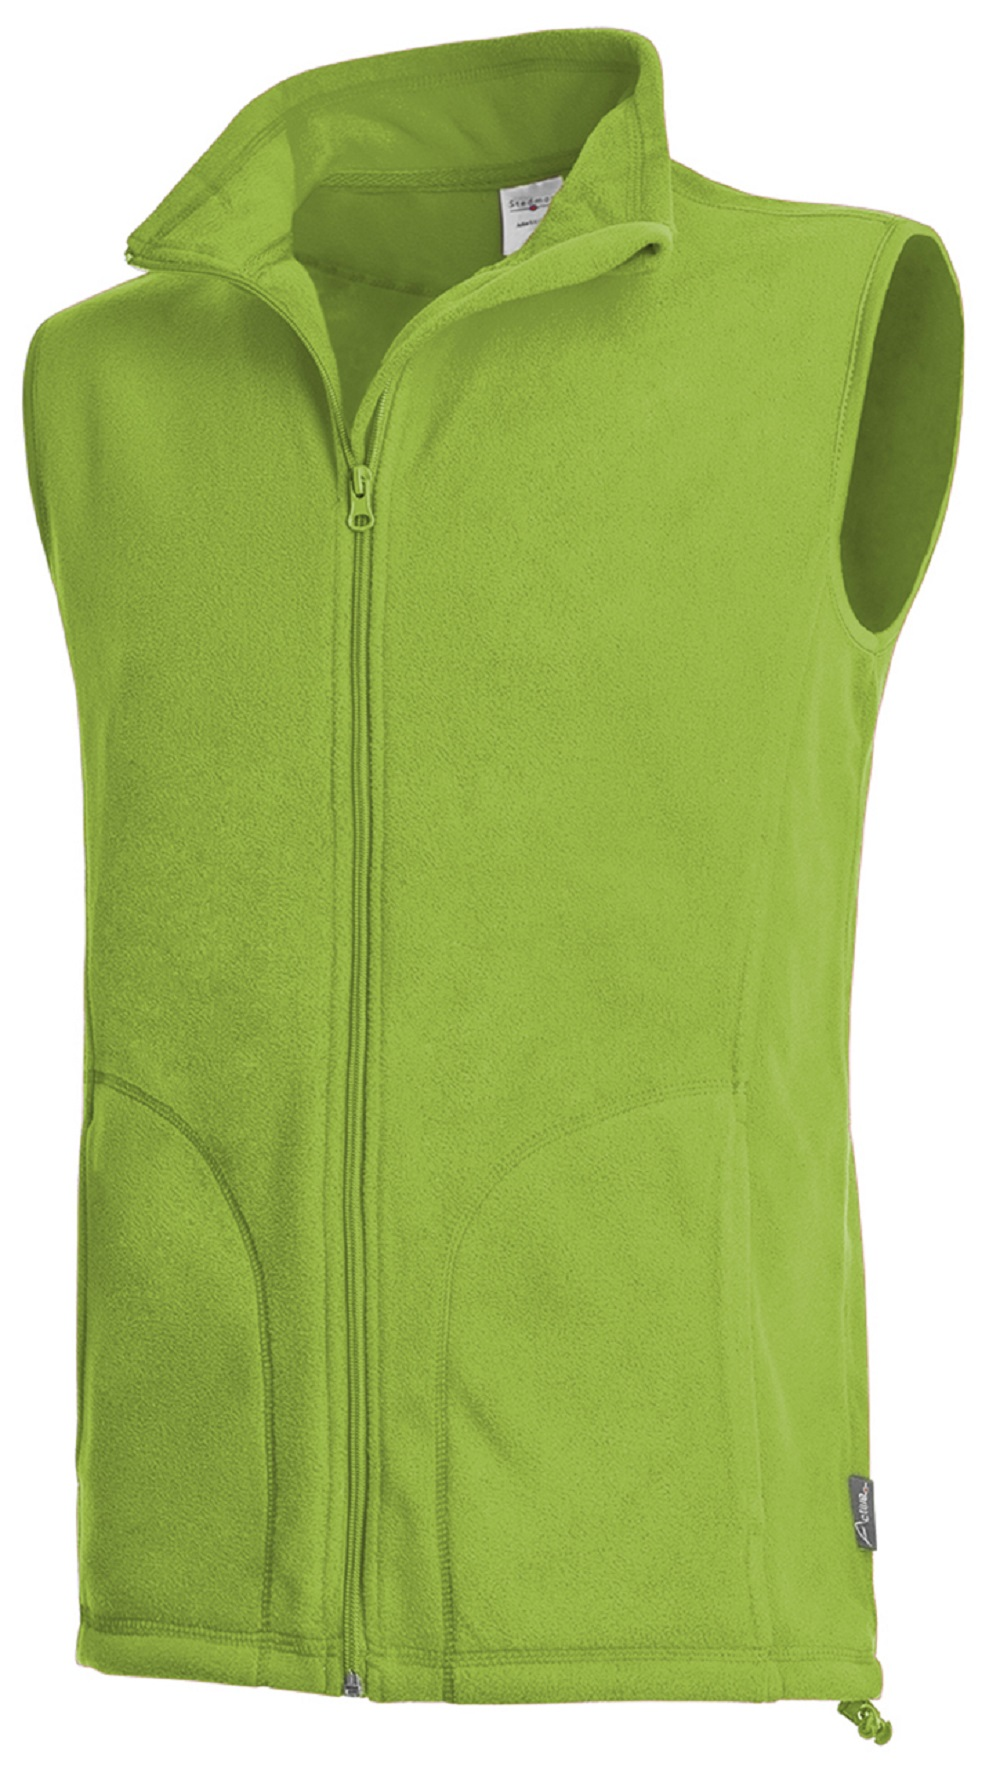 active vest kiwi green